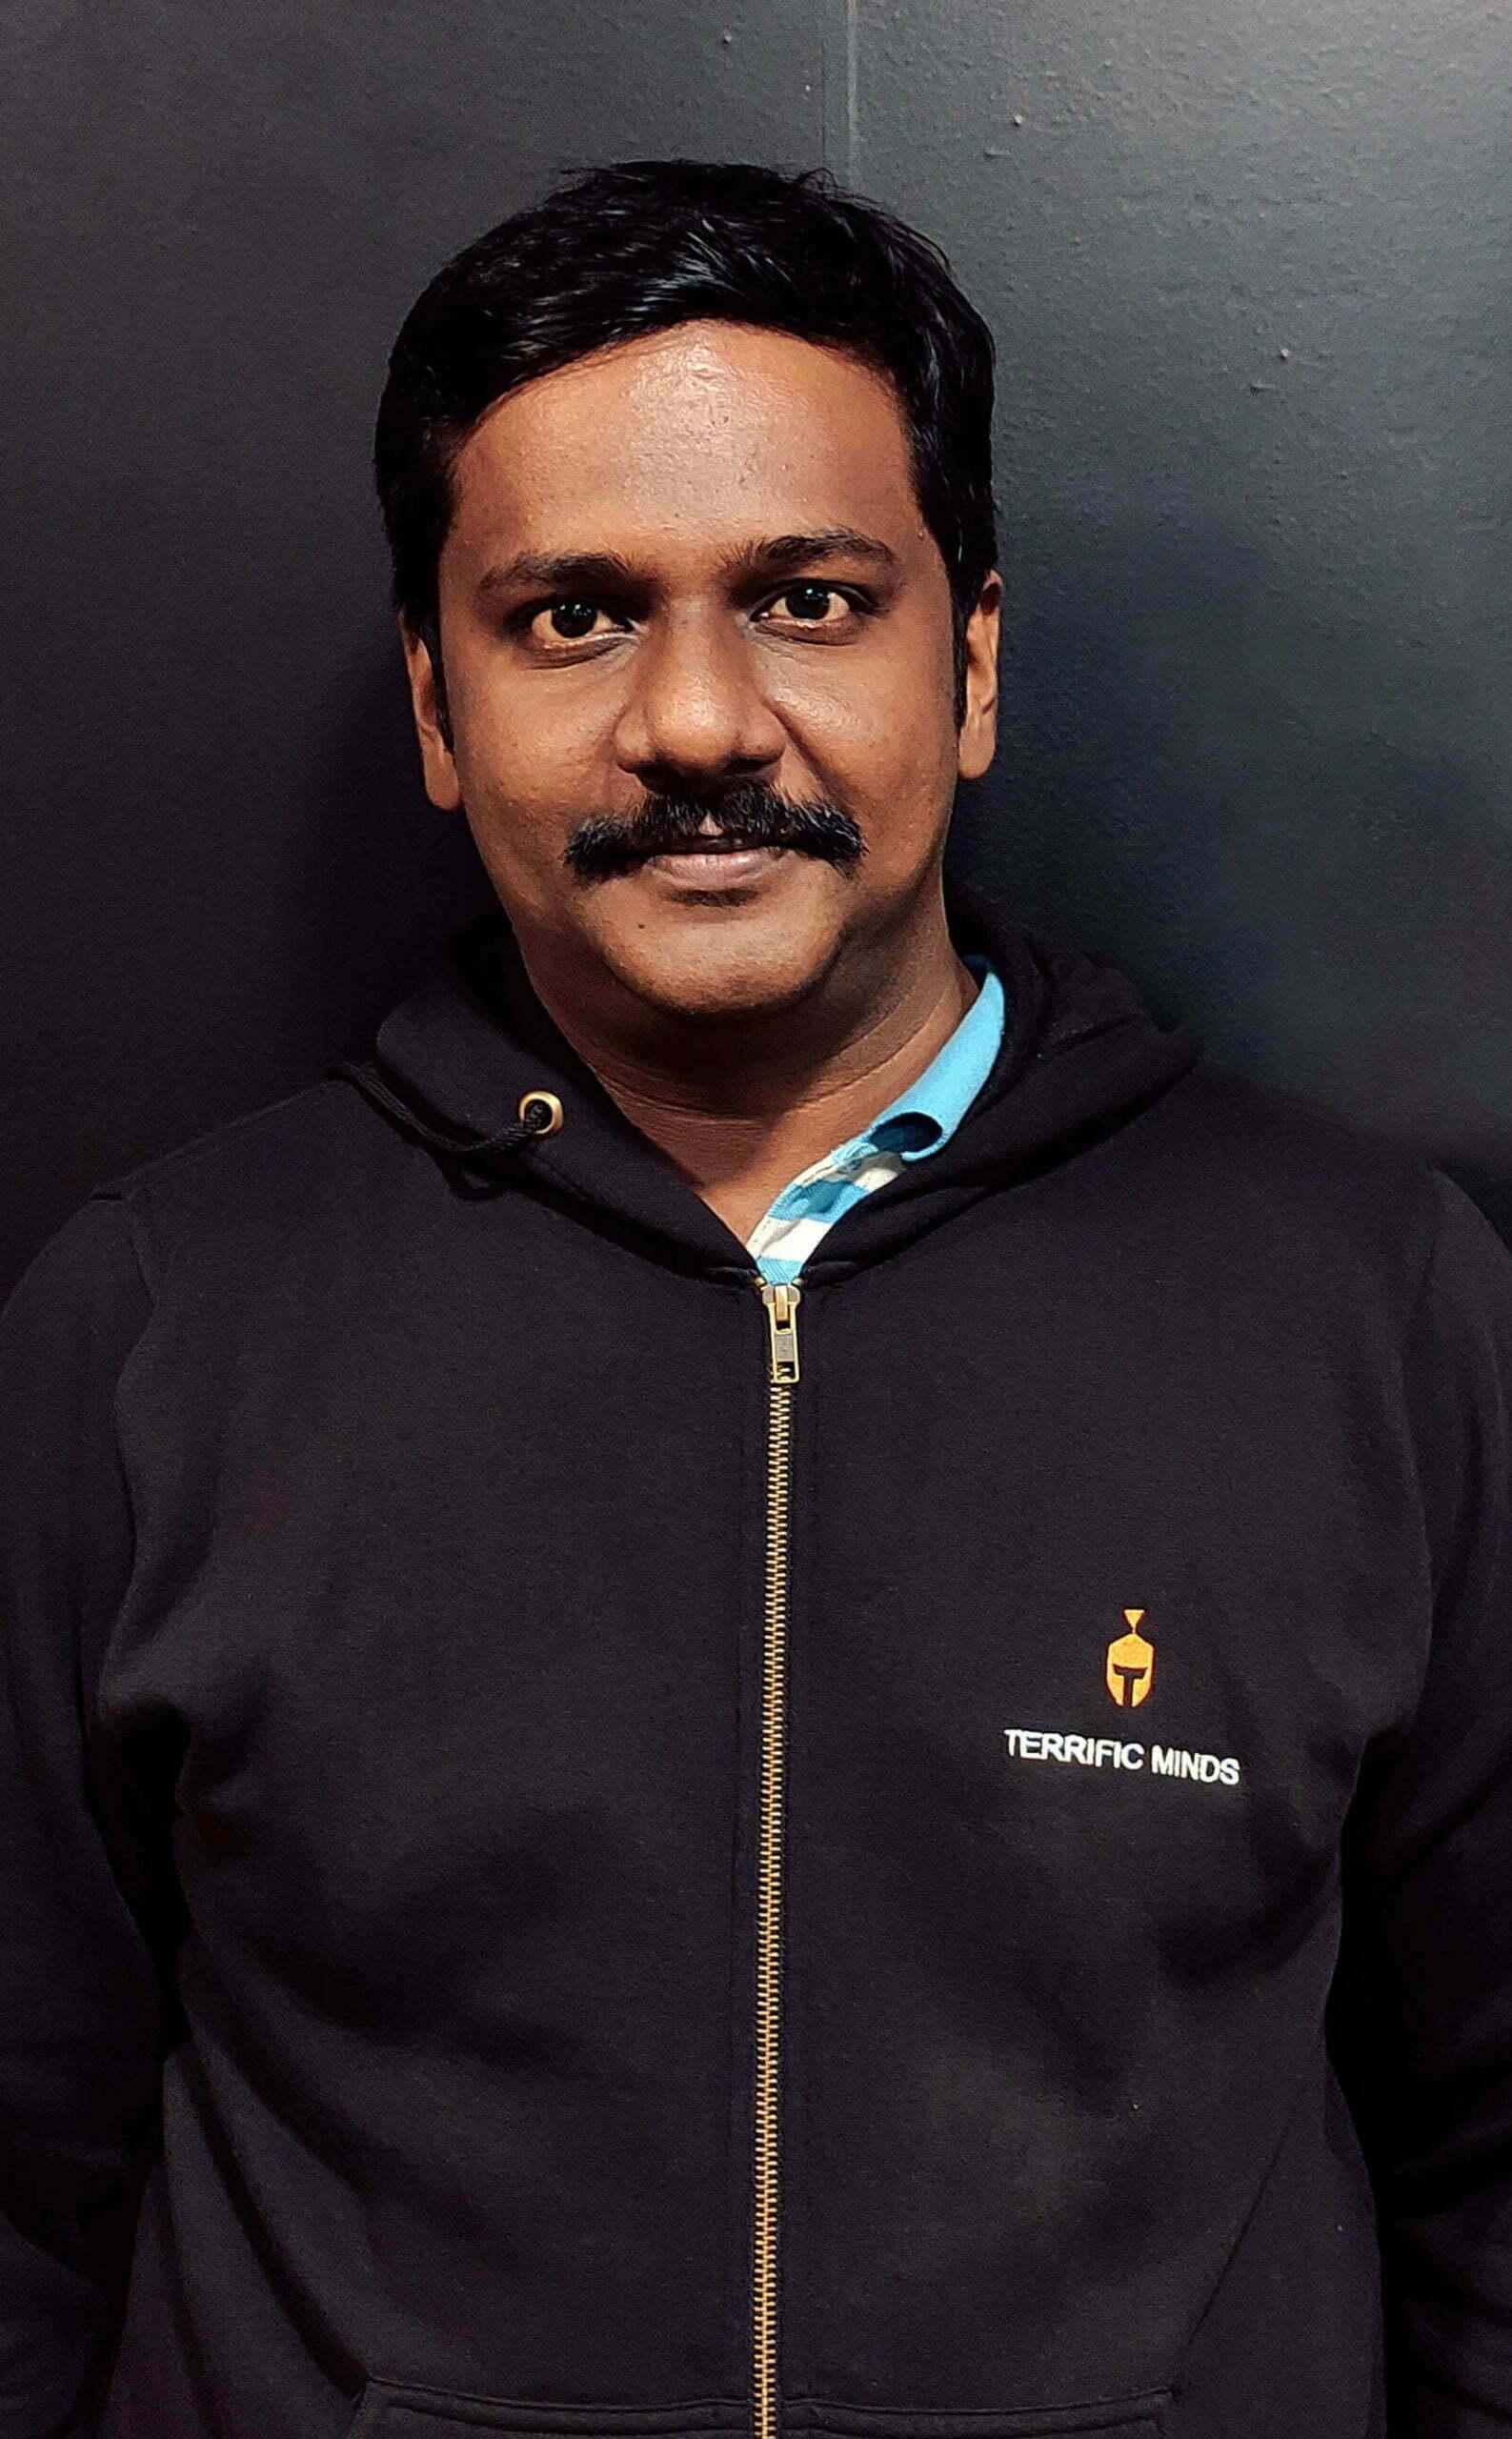 Hari Gangadharan Terrific Minds CTO